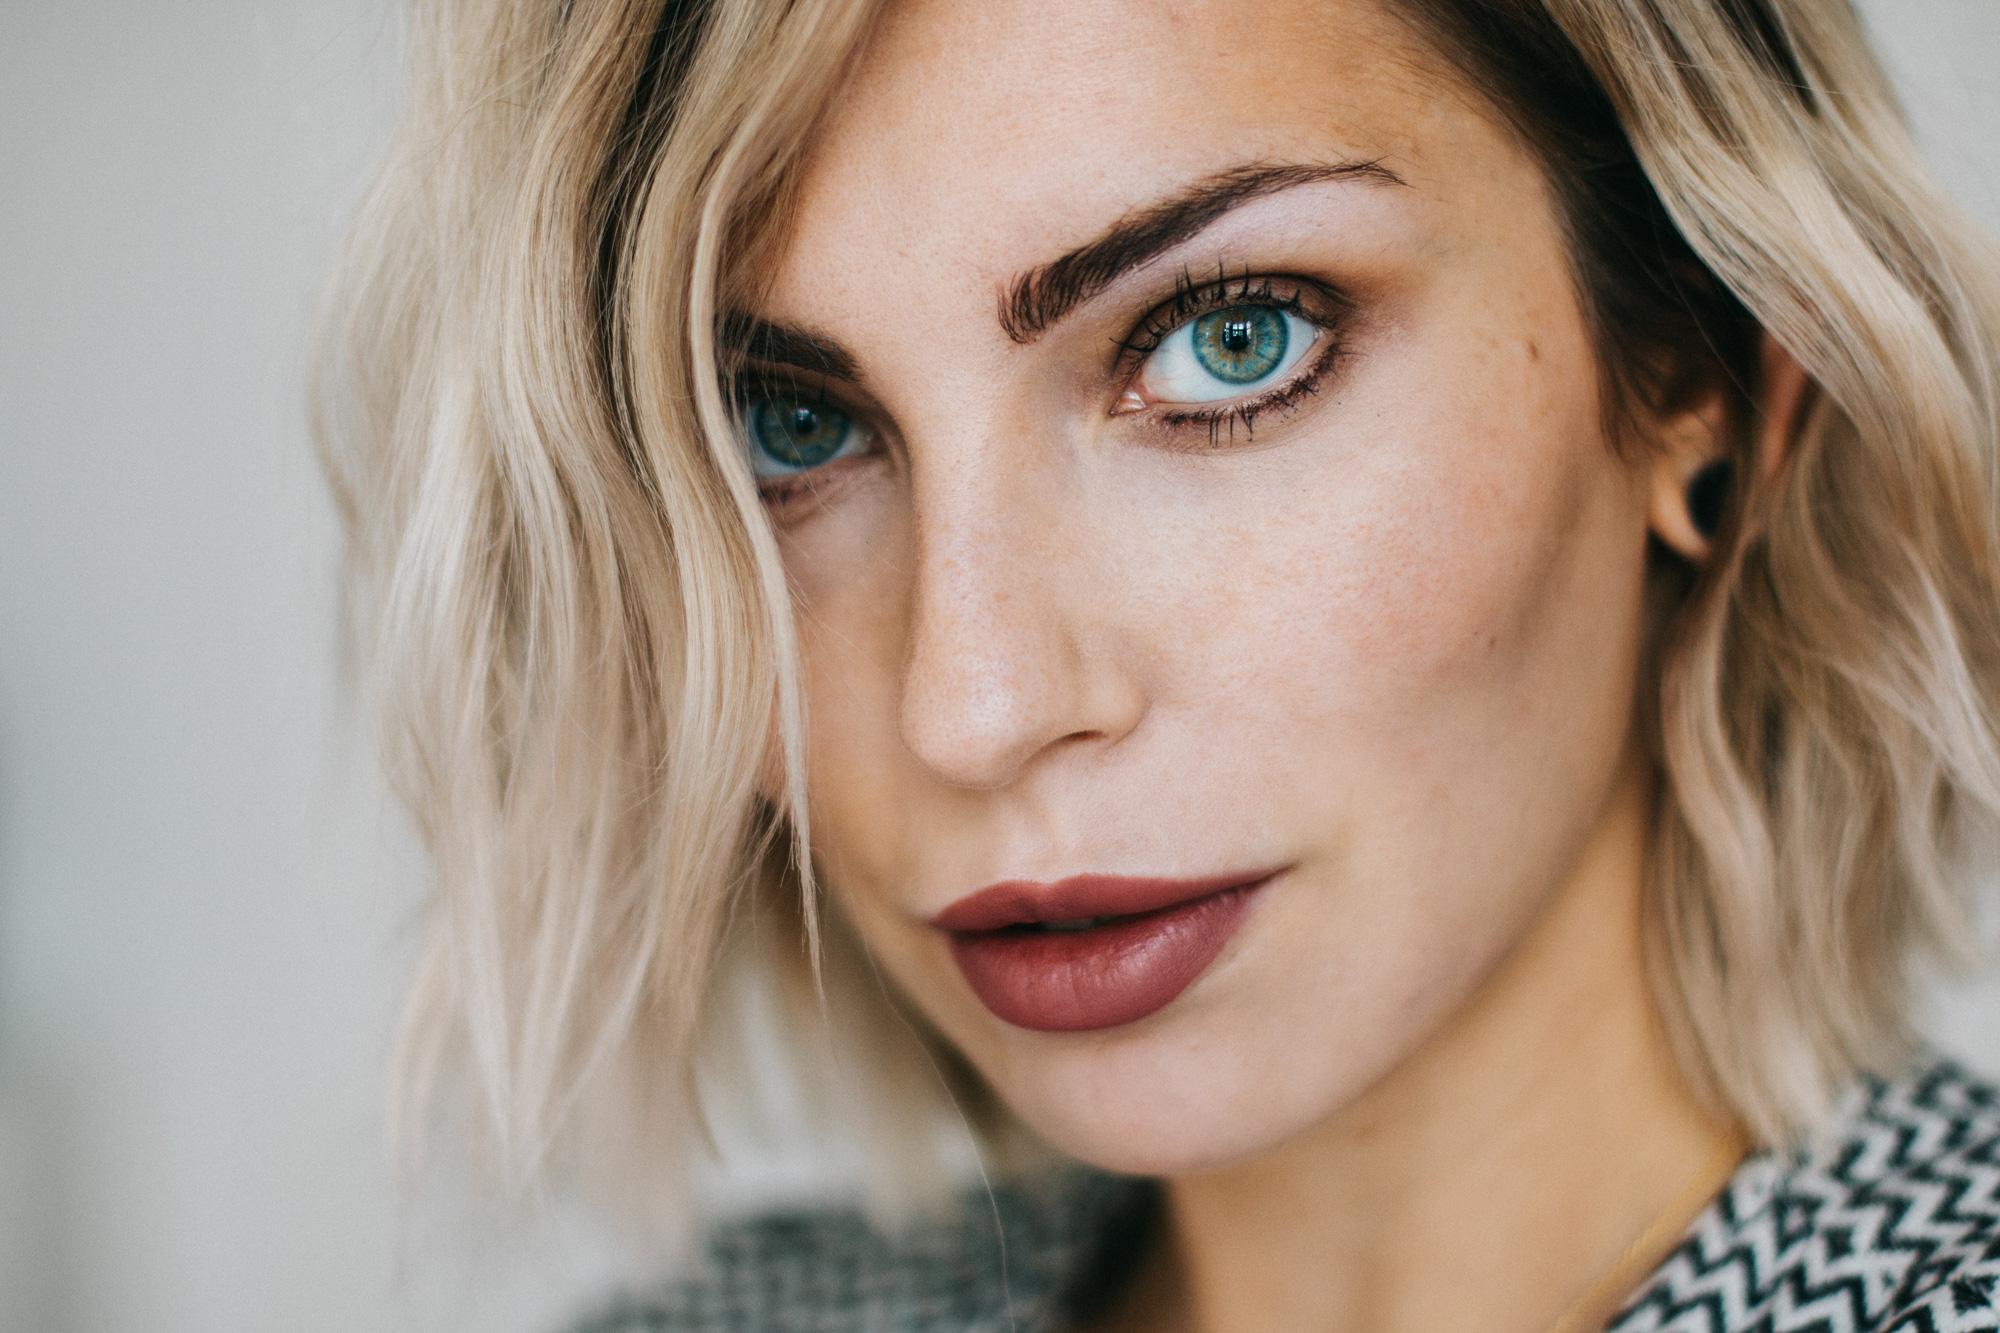 7 new eyebrow hacks to improve your look